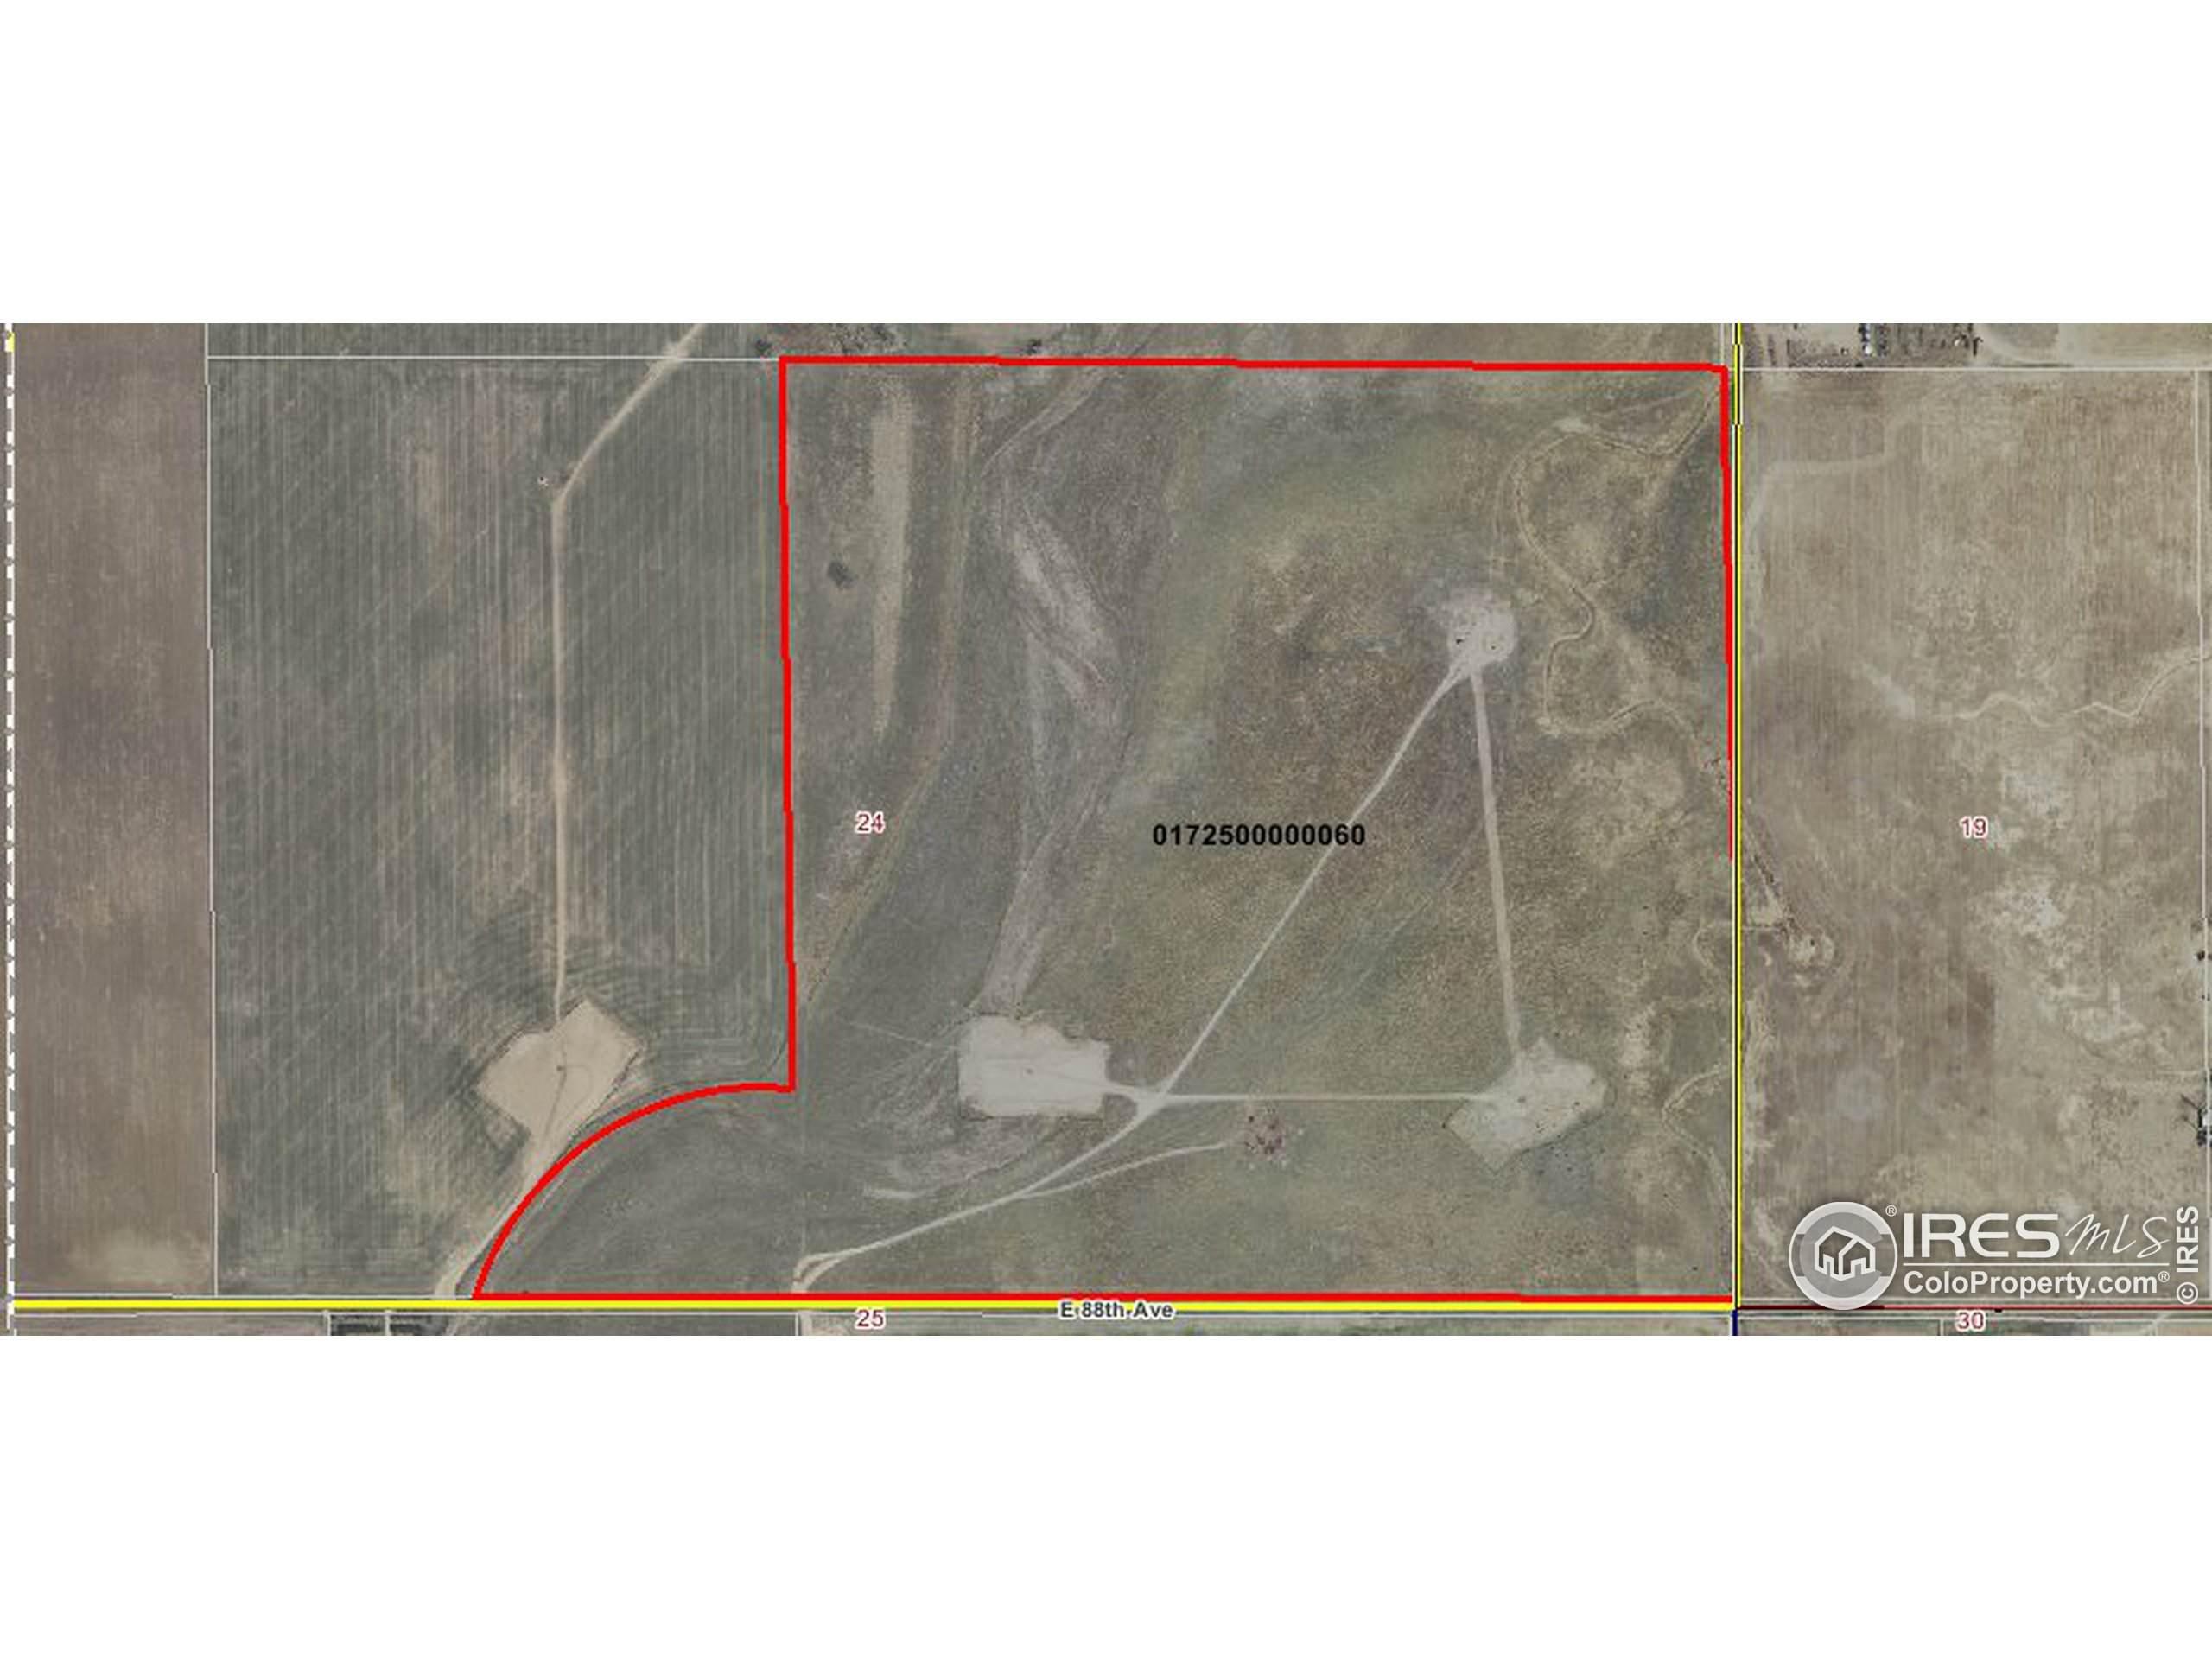 1235 Sherman St, Longmont, CO 80501 (#939738) :: My Home Team